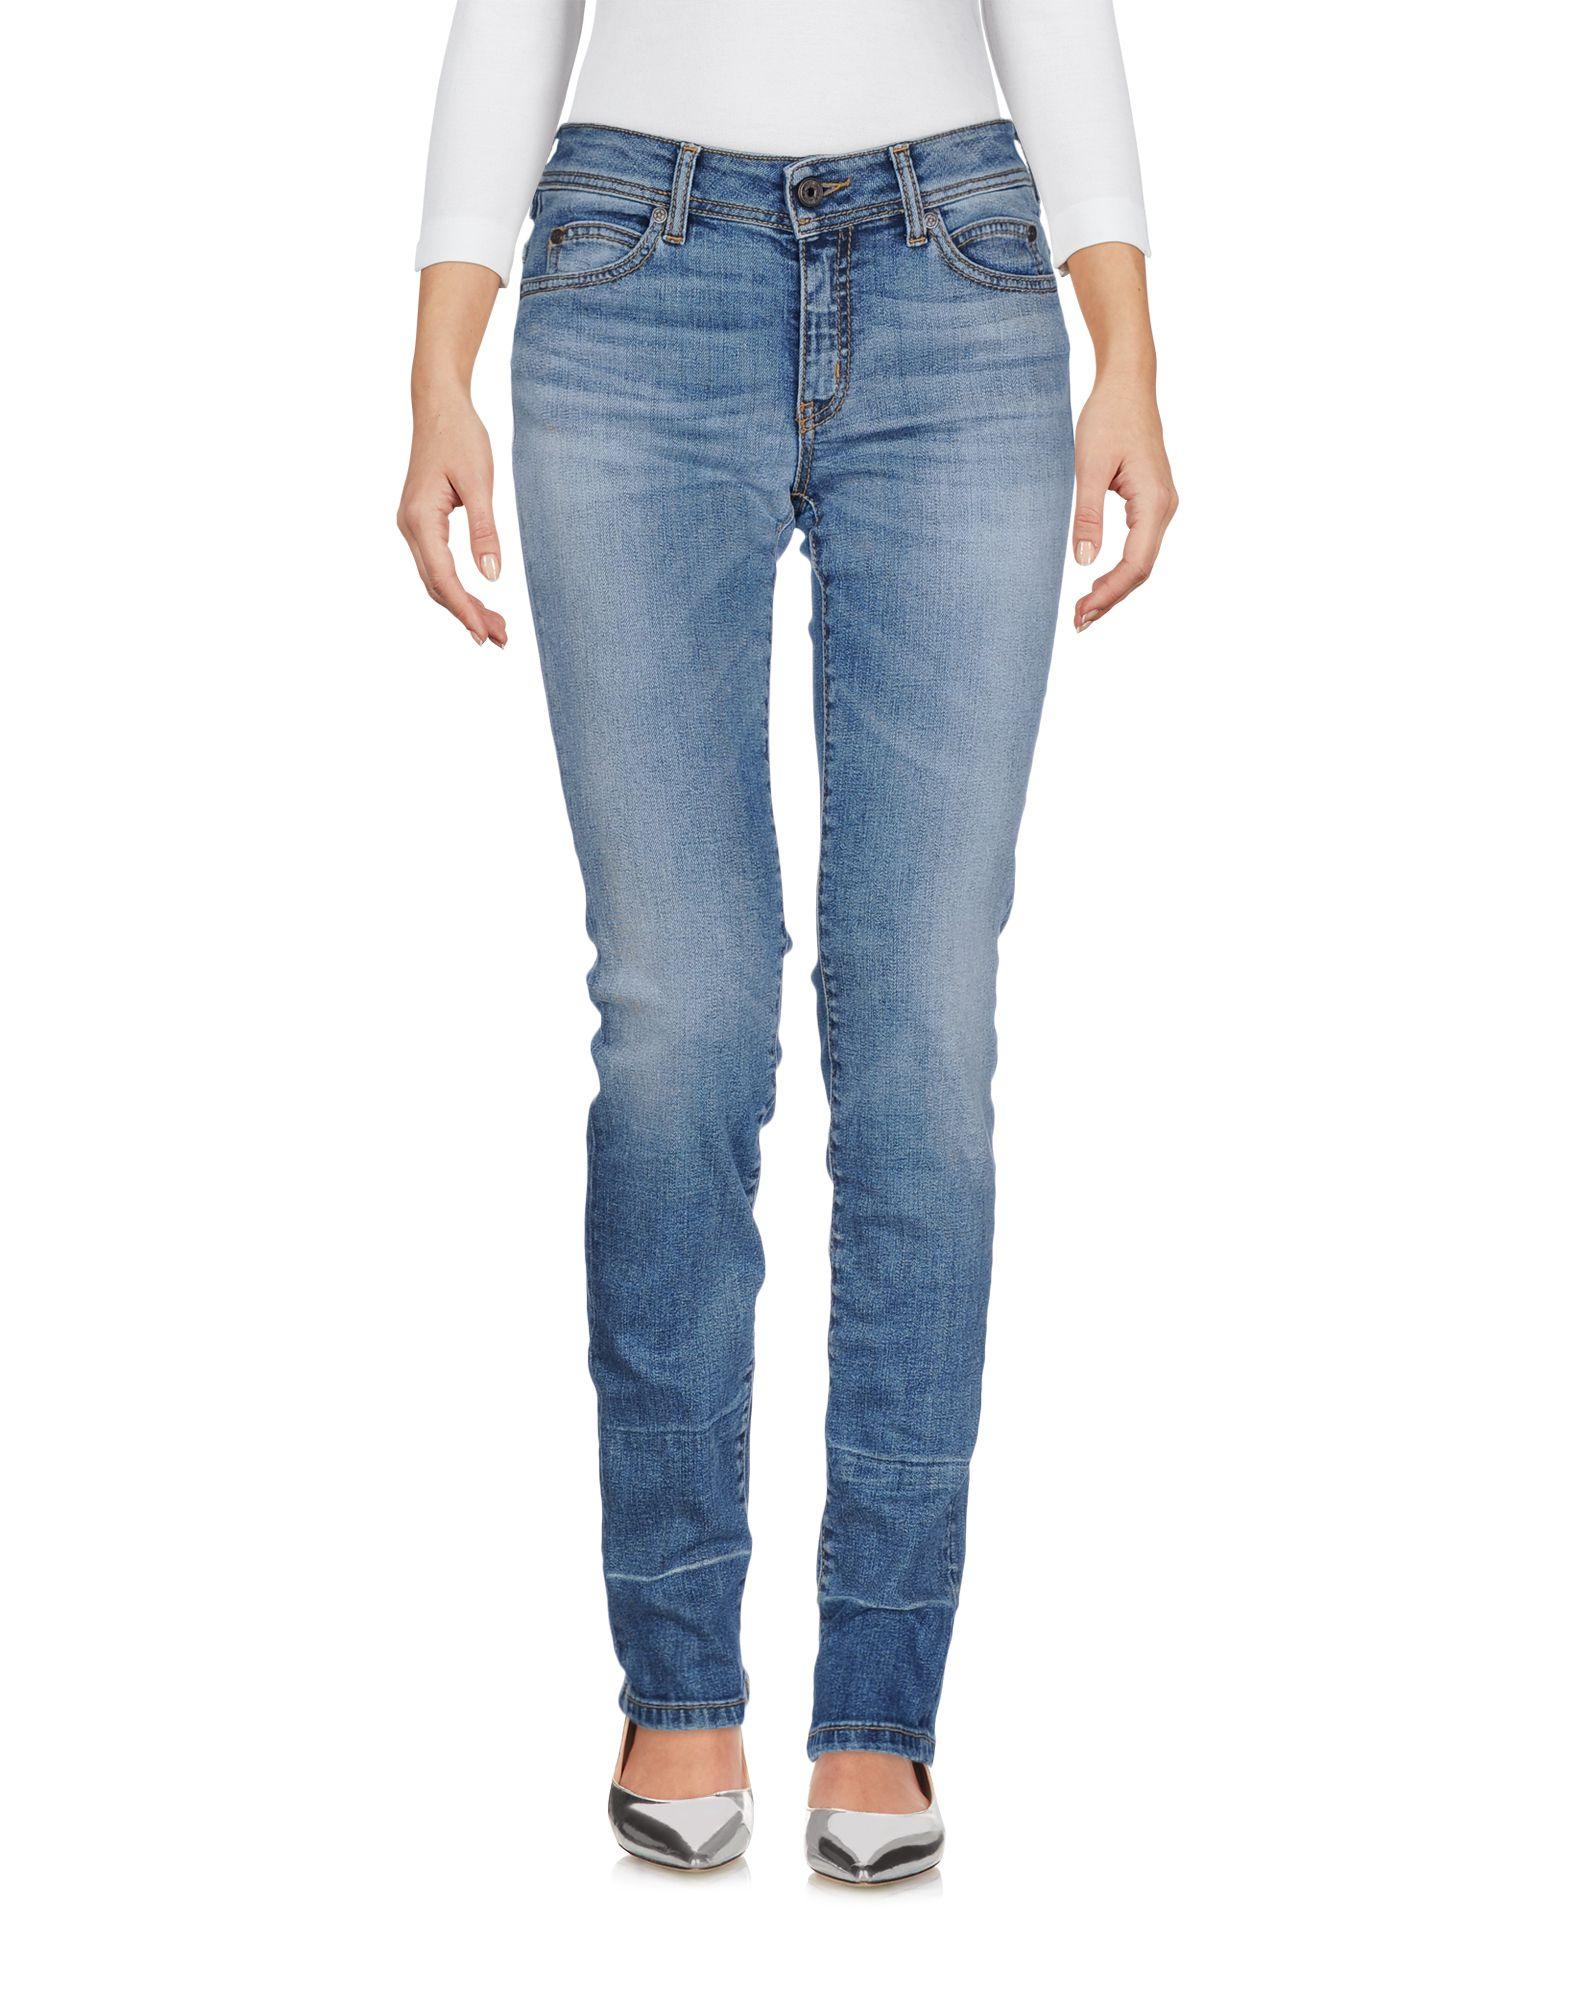 Pantaloni Jeans Just Cavalli Donna - Acquista online su RyhjKpQf